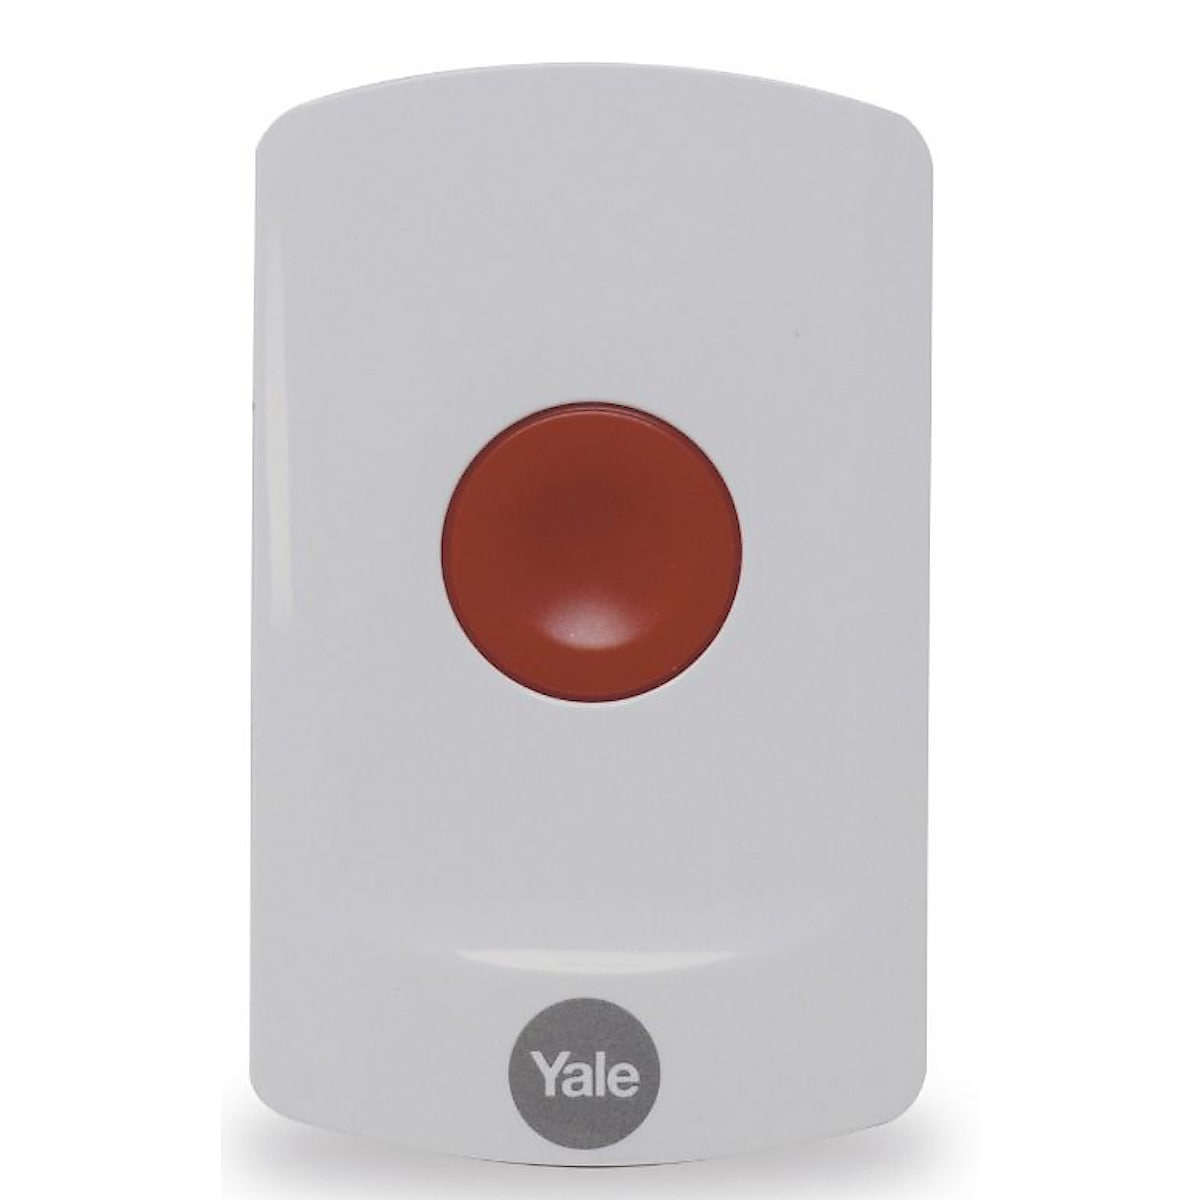 Yale Sync Alarm Panic Button